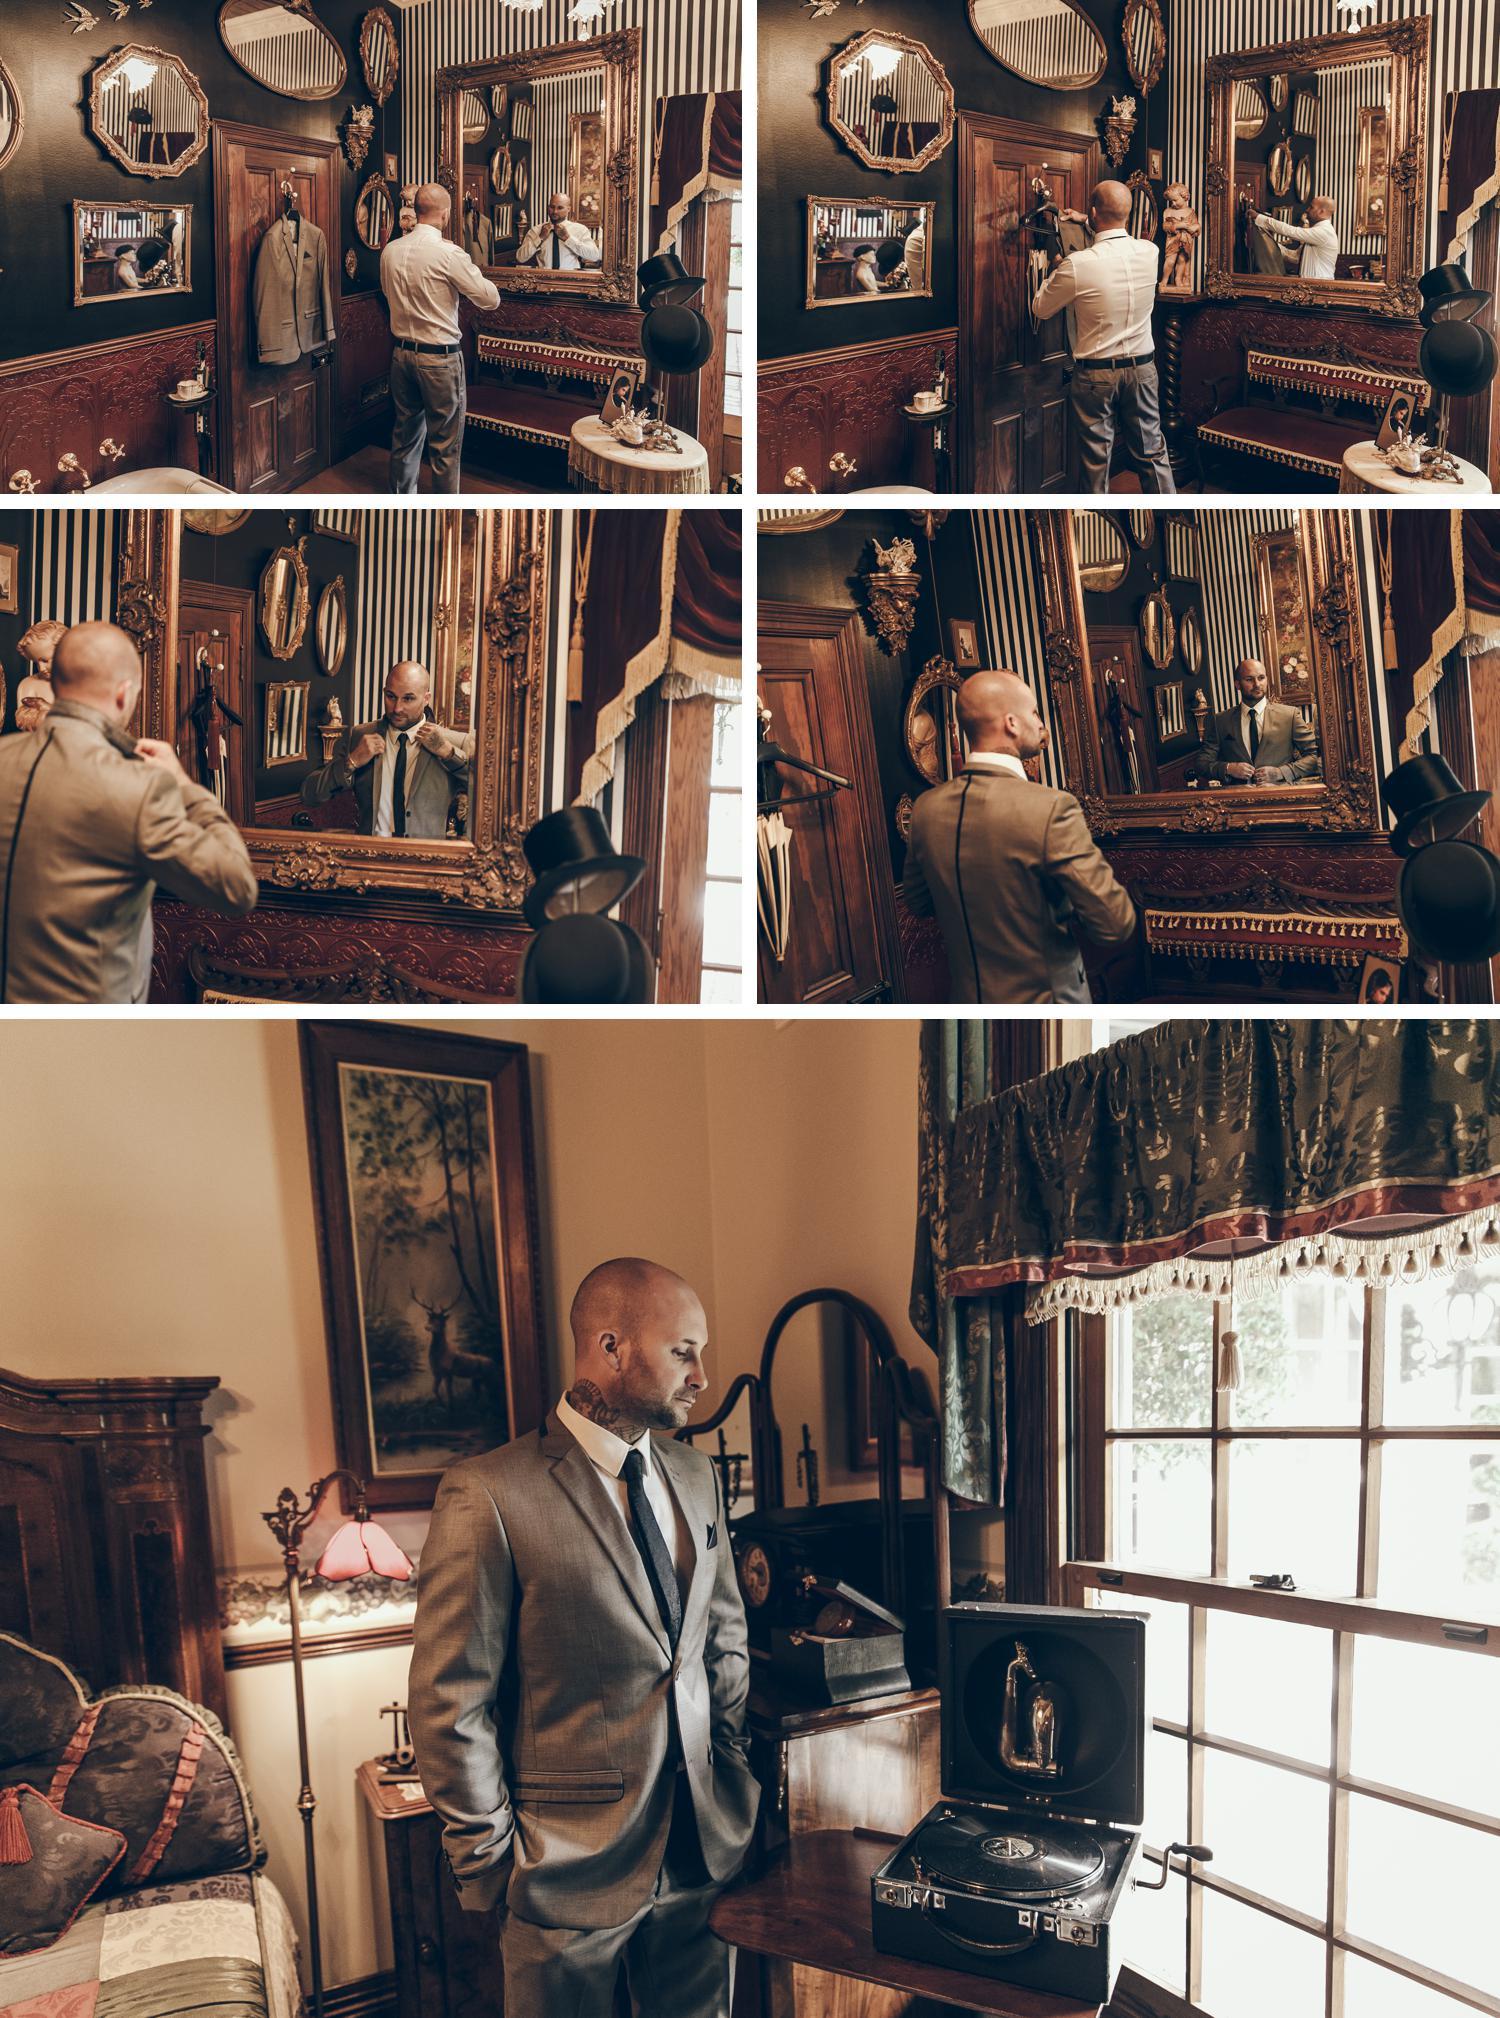 Rural Gippsland Wedding Photos, Intimate Property Wedding Photos Groom Getting Ready by Danae Studios